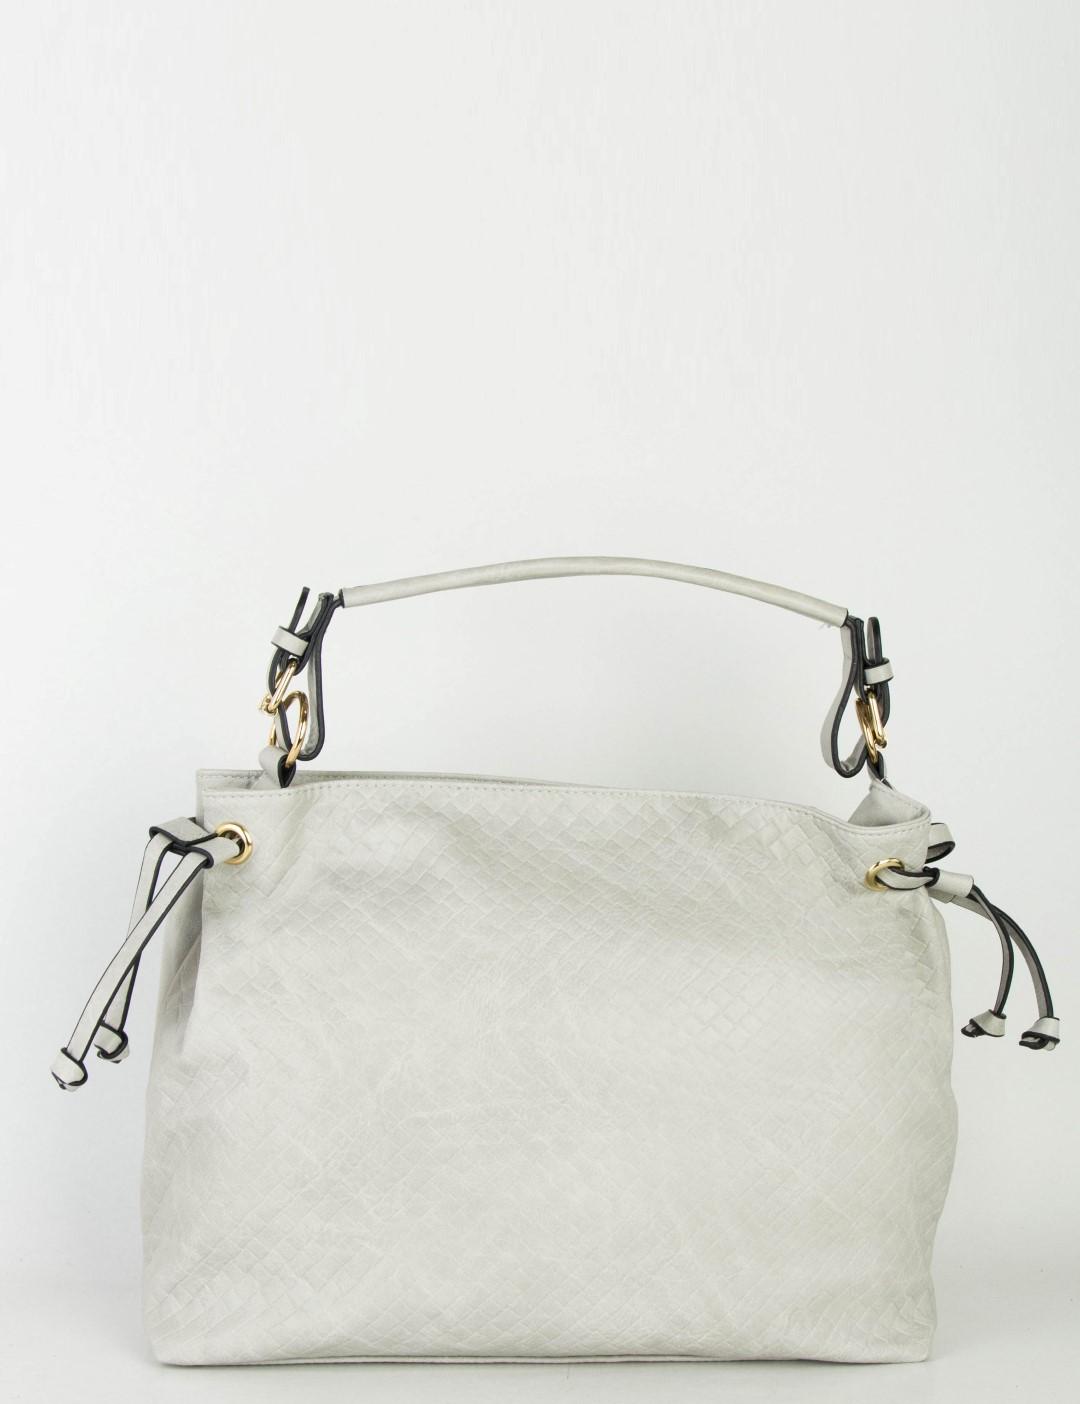 6c92c1b7cc Γυναικεία γκρι τσάντα ώμου μονόχρωμη ανάγλυφη 994024